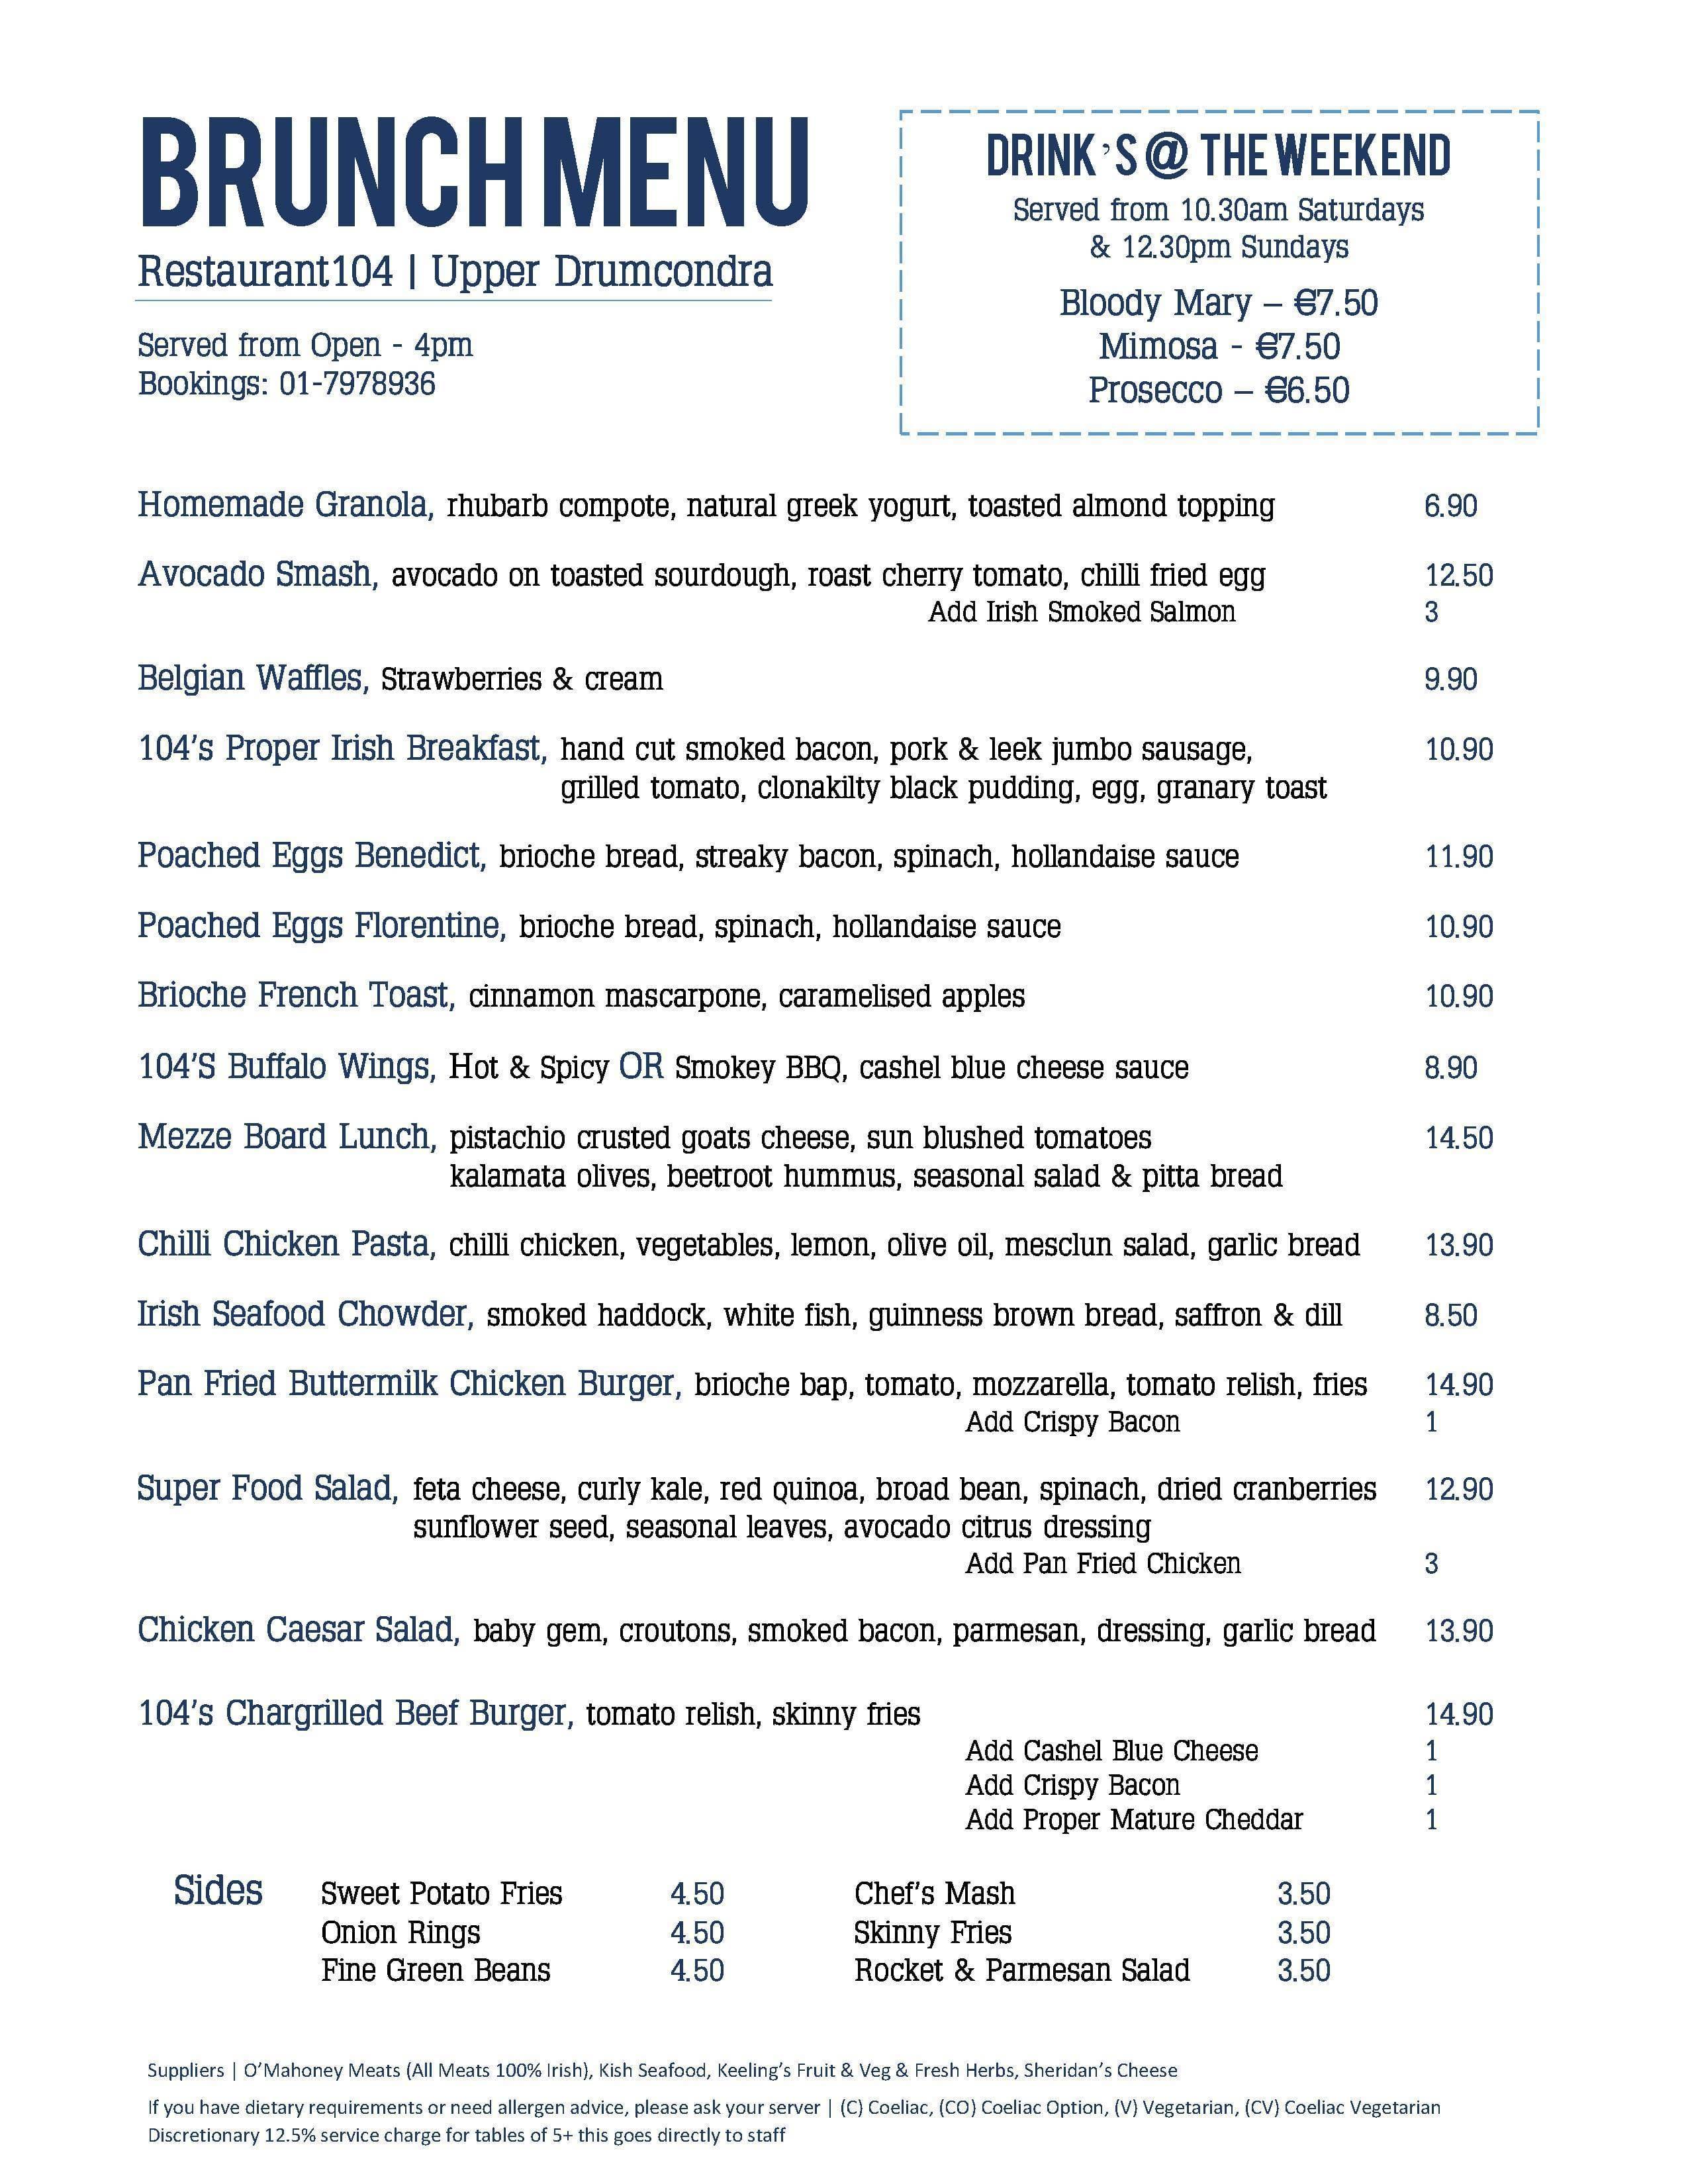 restaurant 104 menu menu for restaurant 104 drumcondra dublin